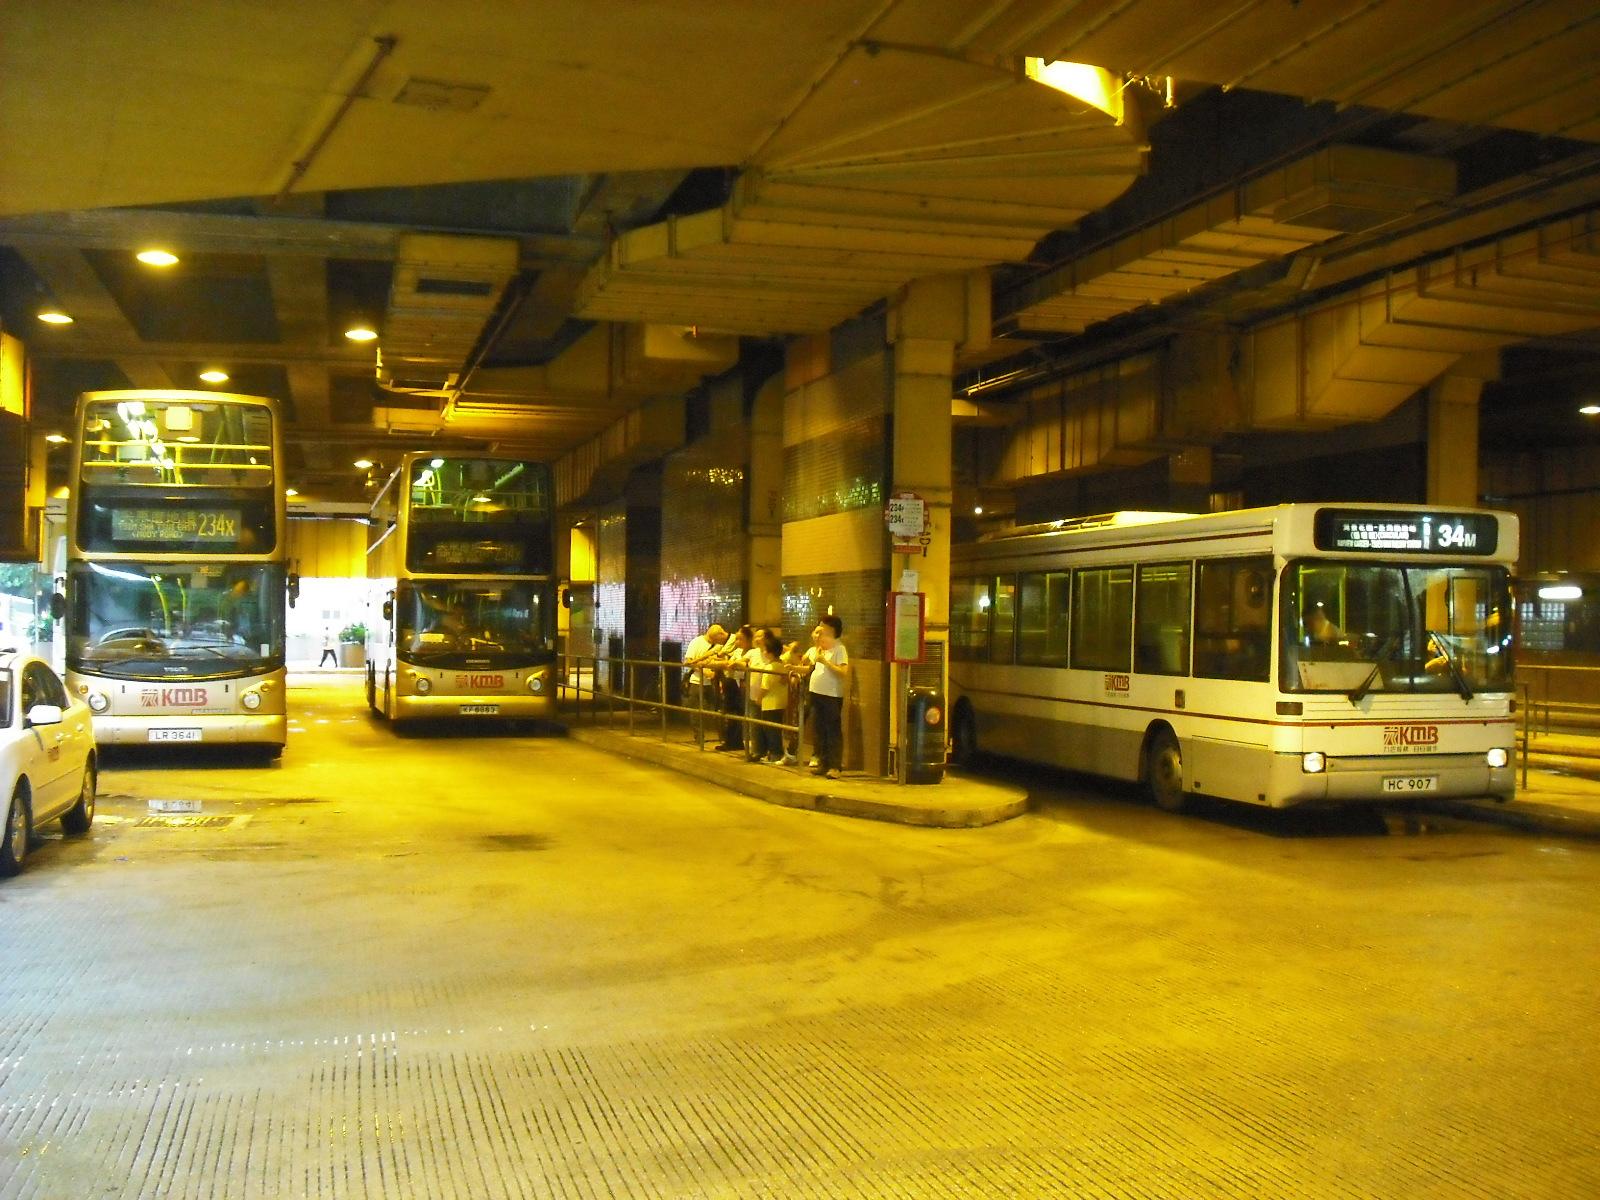 File:Bayview Garden Bus Terminus.JPG - Wikimedia Commons